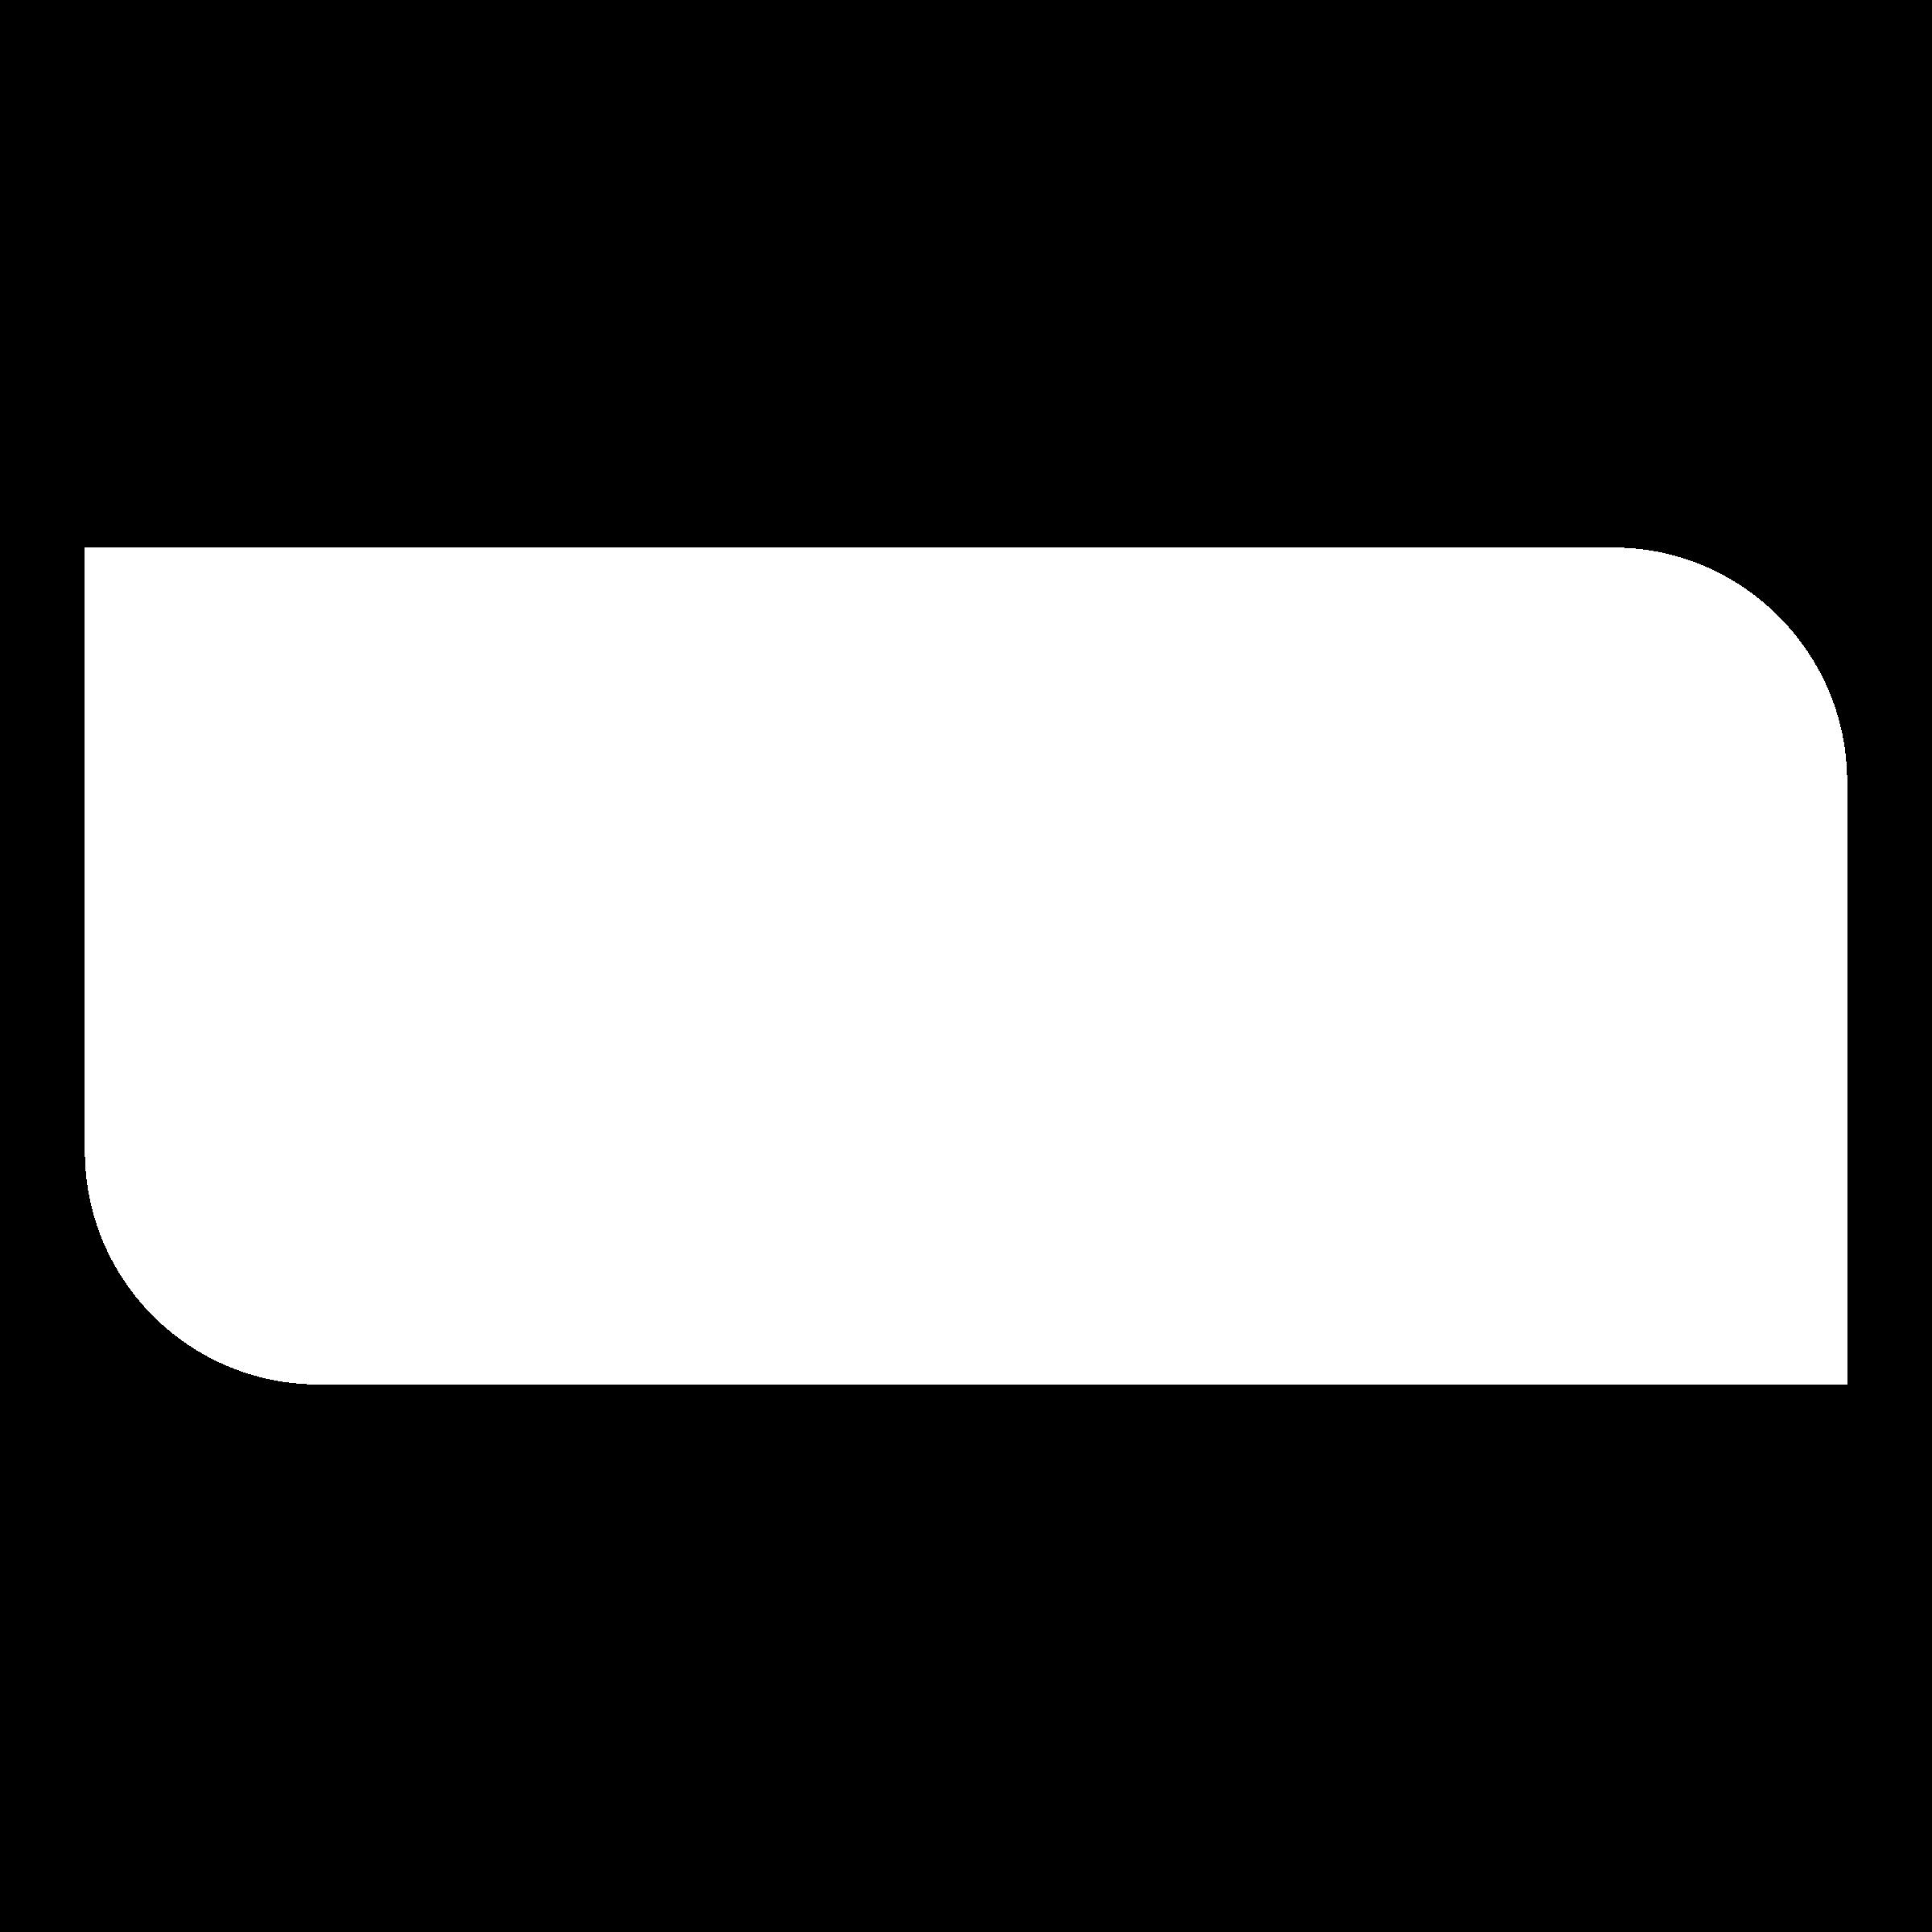 Unity Logo PNG Transparent & SVG Vector - Freebie Supply